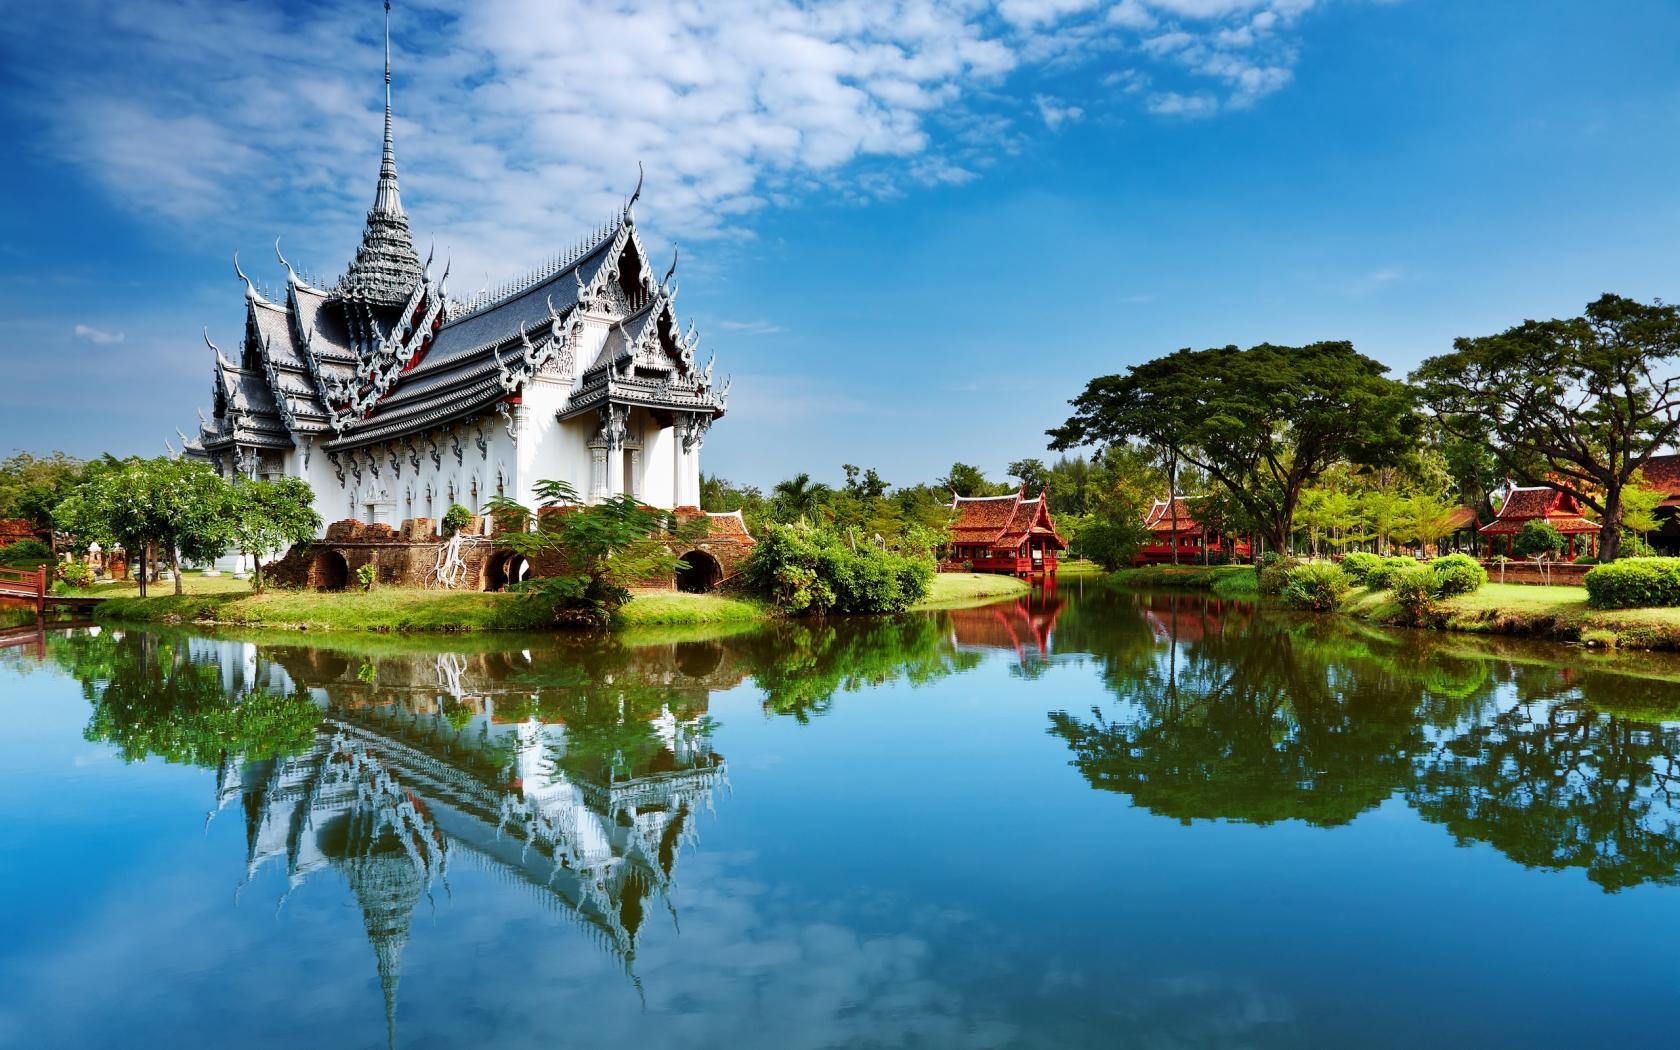 http://www.cedratour.ro/wp-content/uploads/2013/06/Thailanda-Pattaya.jpg